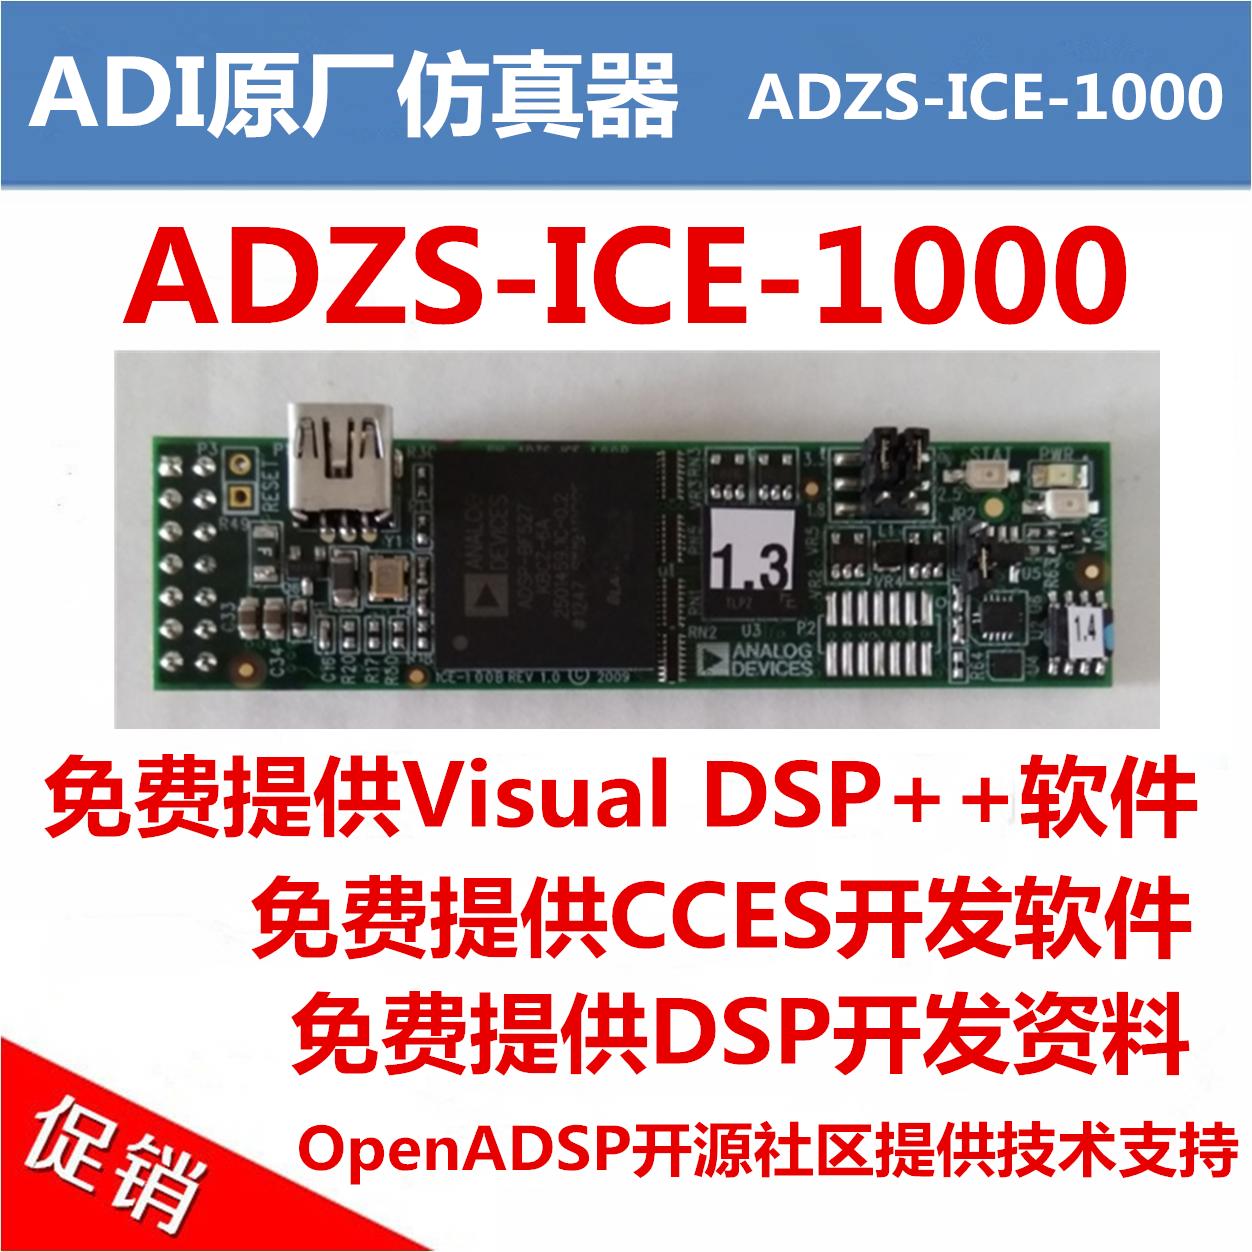 ADZS-ICE-1000 Adi original emulator stock (OpenADSP open source